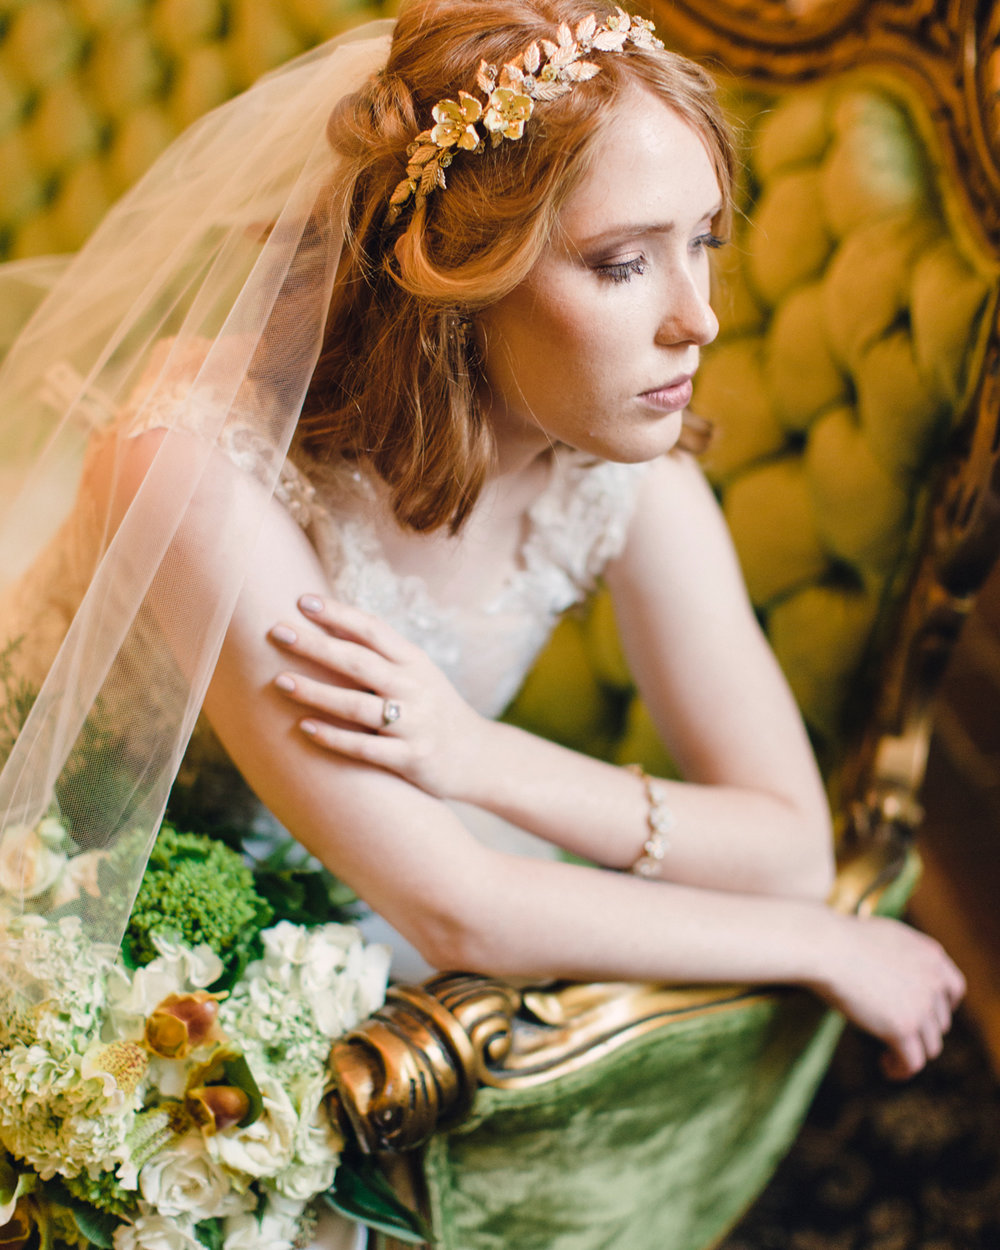 Natural Romantic Emerald Styled Photoshoot Hair Makeup